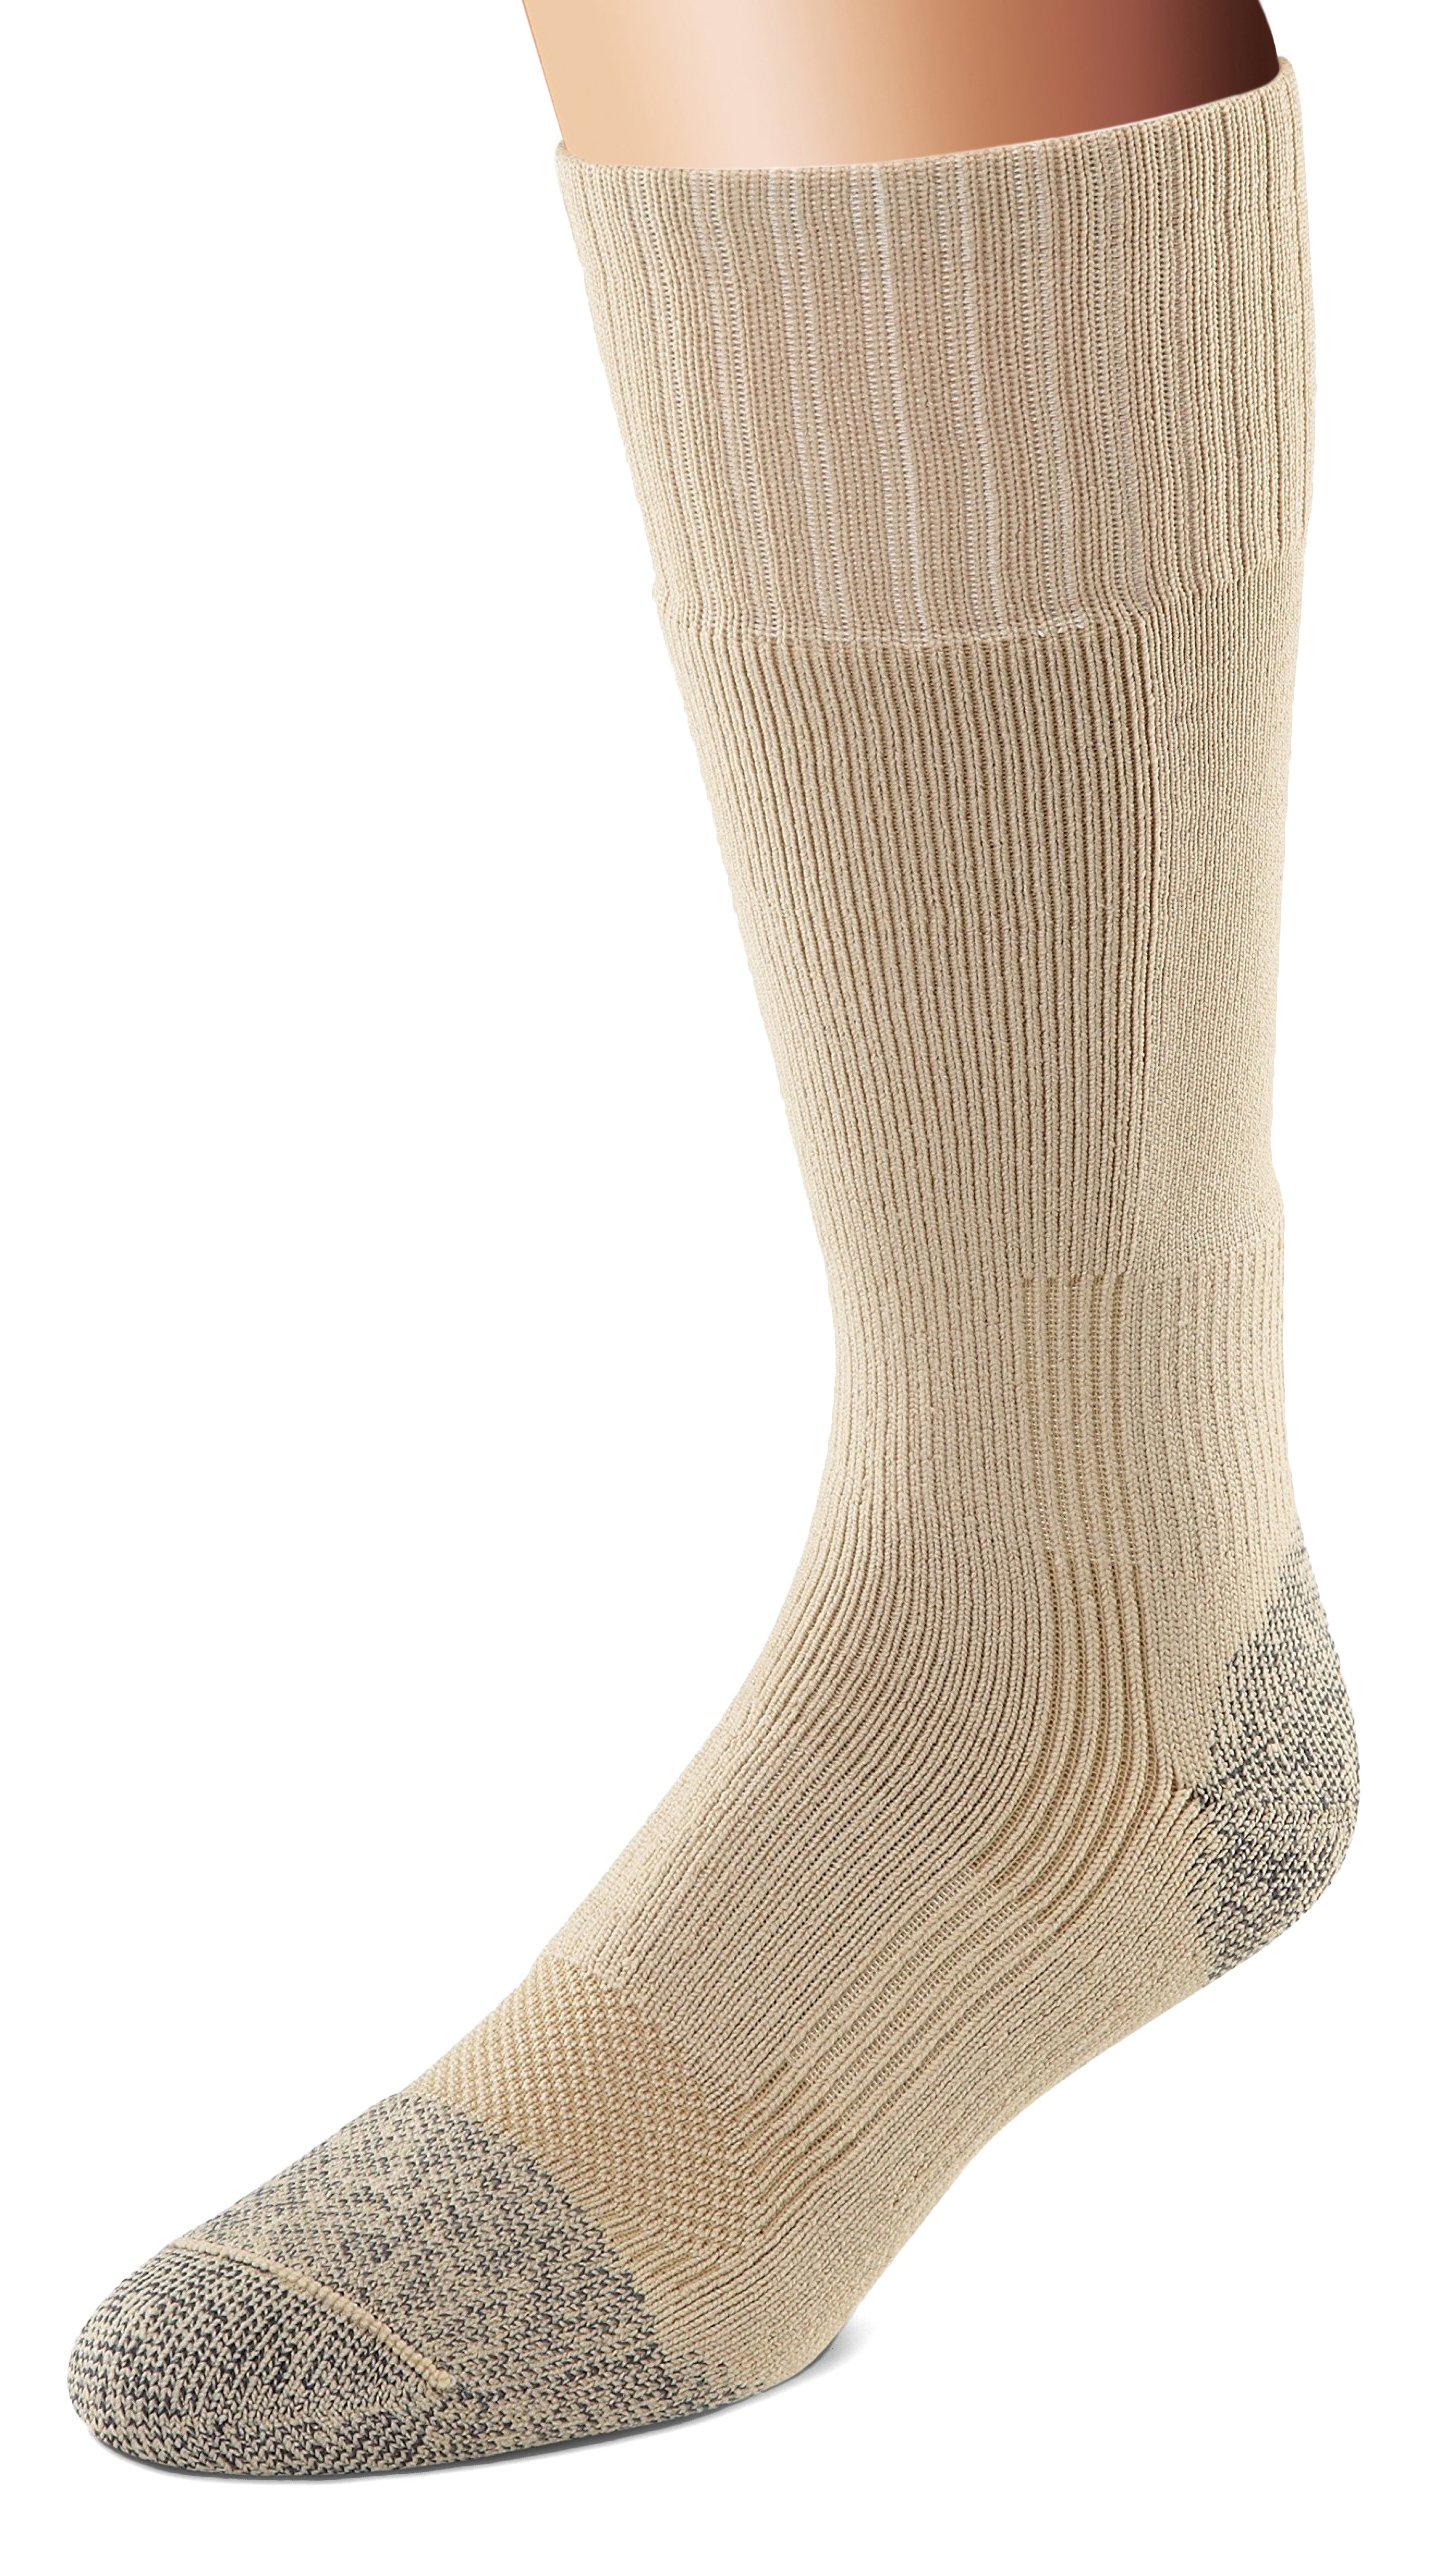 Fox River Military Wick Dry Maximum Mid Calf Boot Sock (XLarge/Beige) by FoxRiver